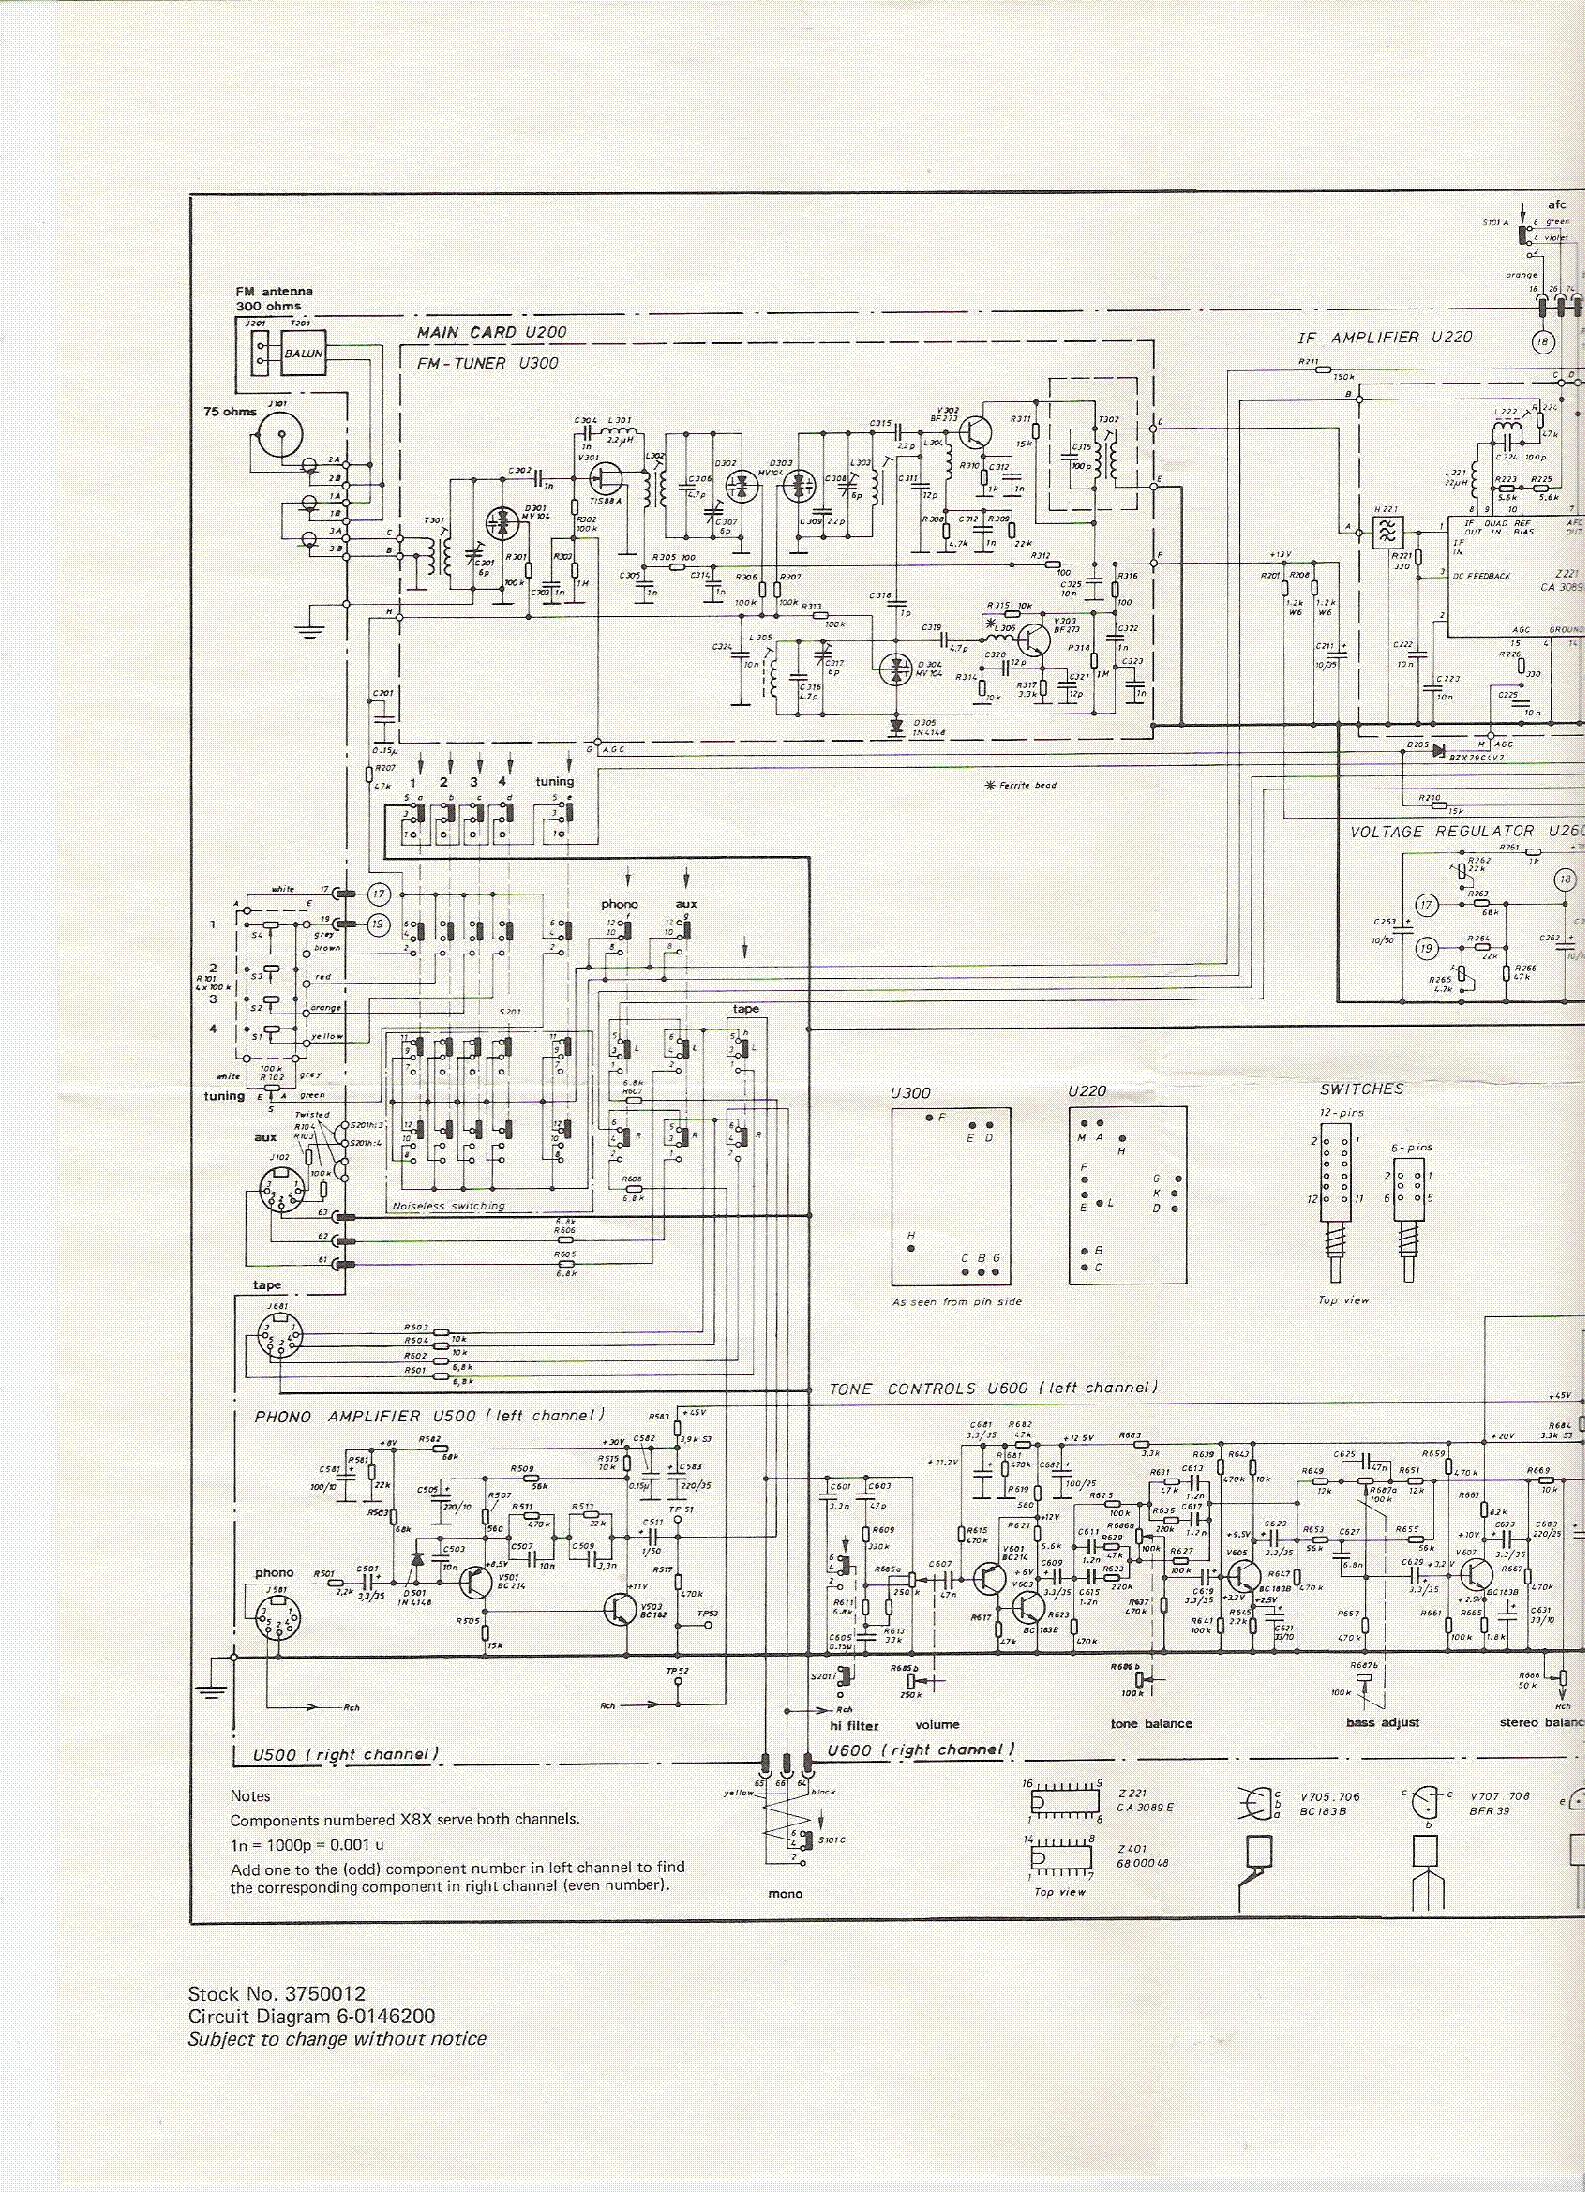 SONAB R4000 Service Manual download, schematics, eeprom